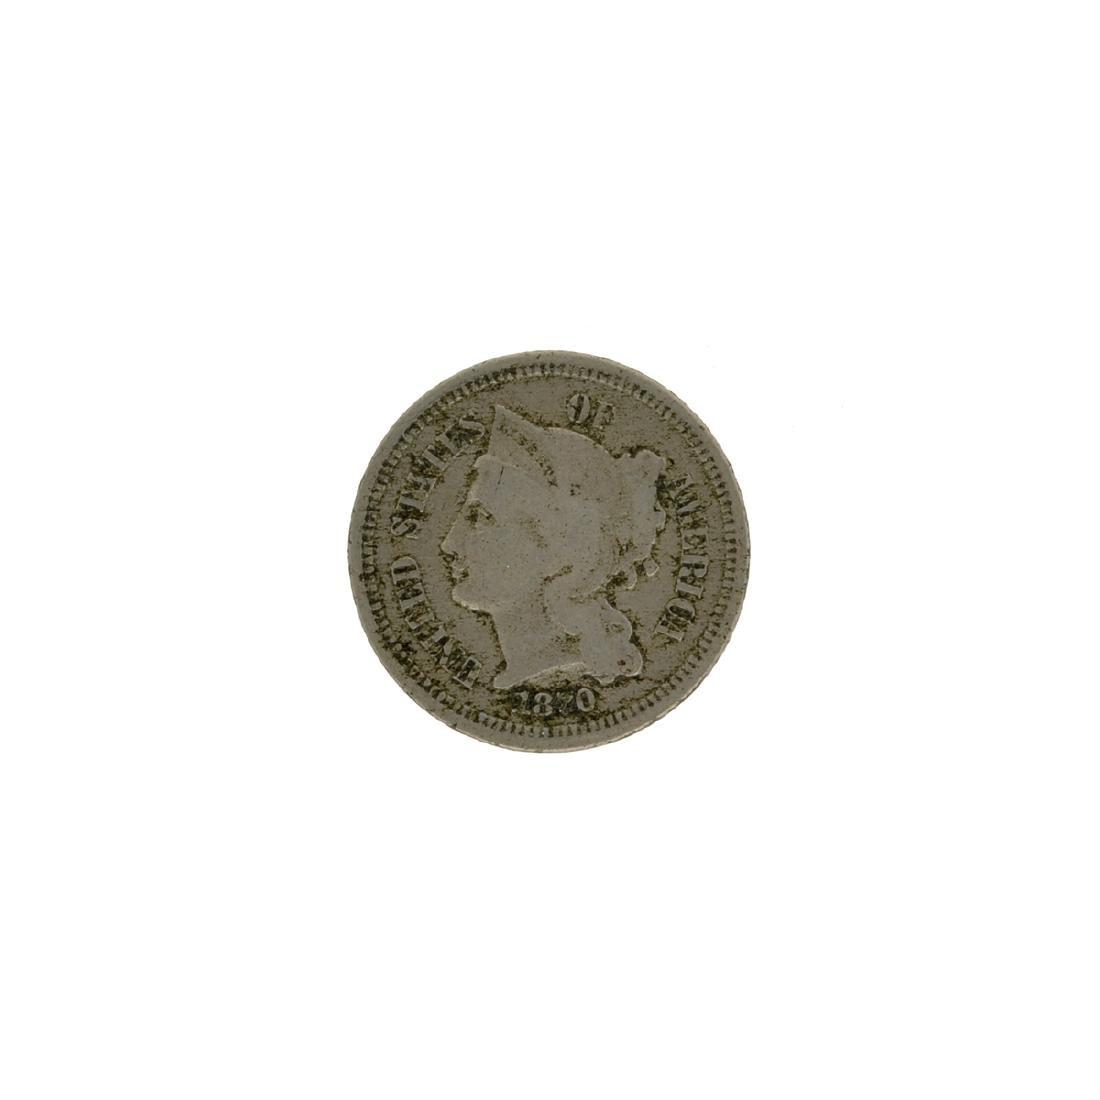 1870 Three Cent Coin